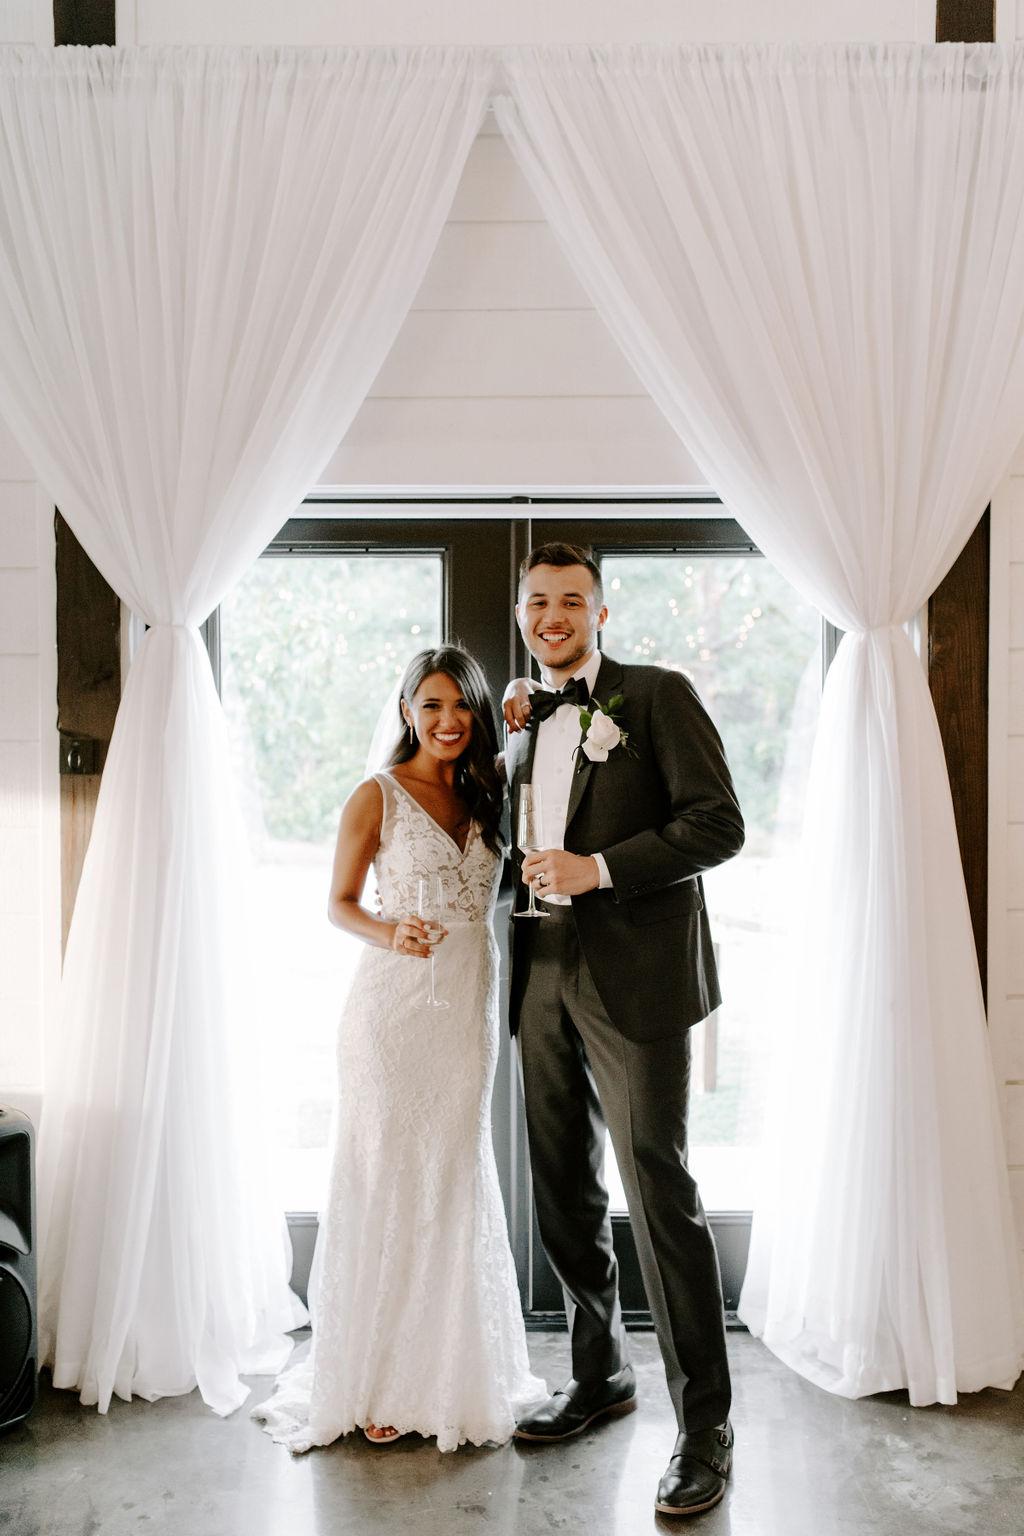 Tulsa White Barn Wedding Venue Outdoor Ceremony 112.jpg